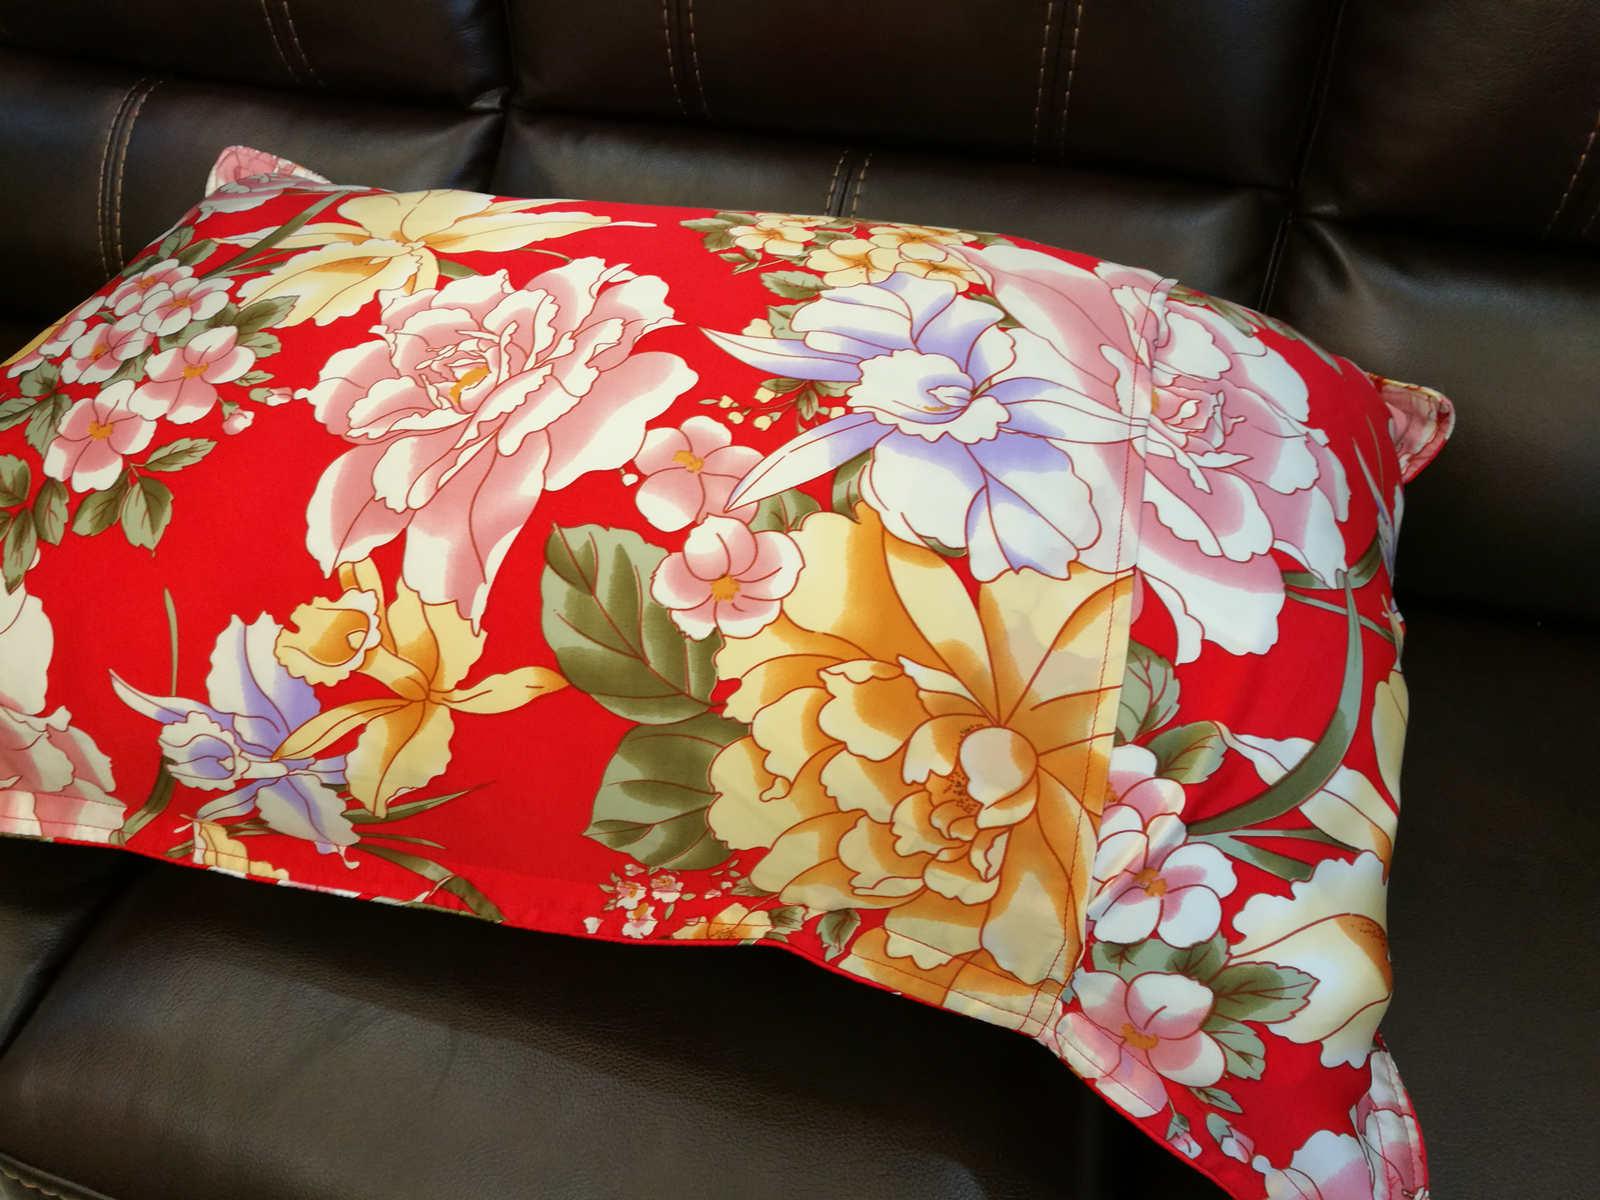 New 100 Silk Oxford Pillowcase Pillow Shams Red Floral